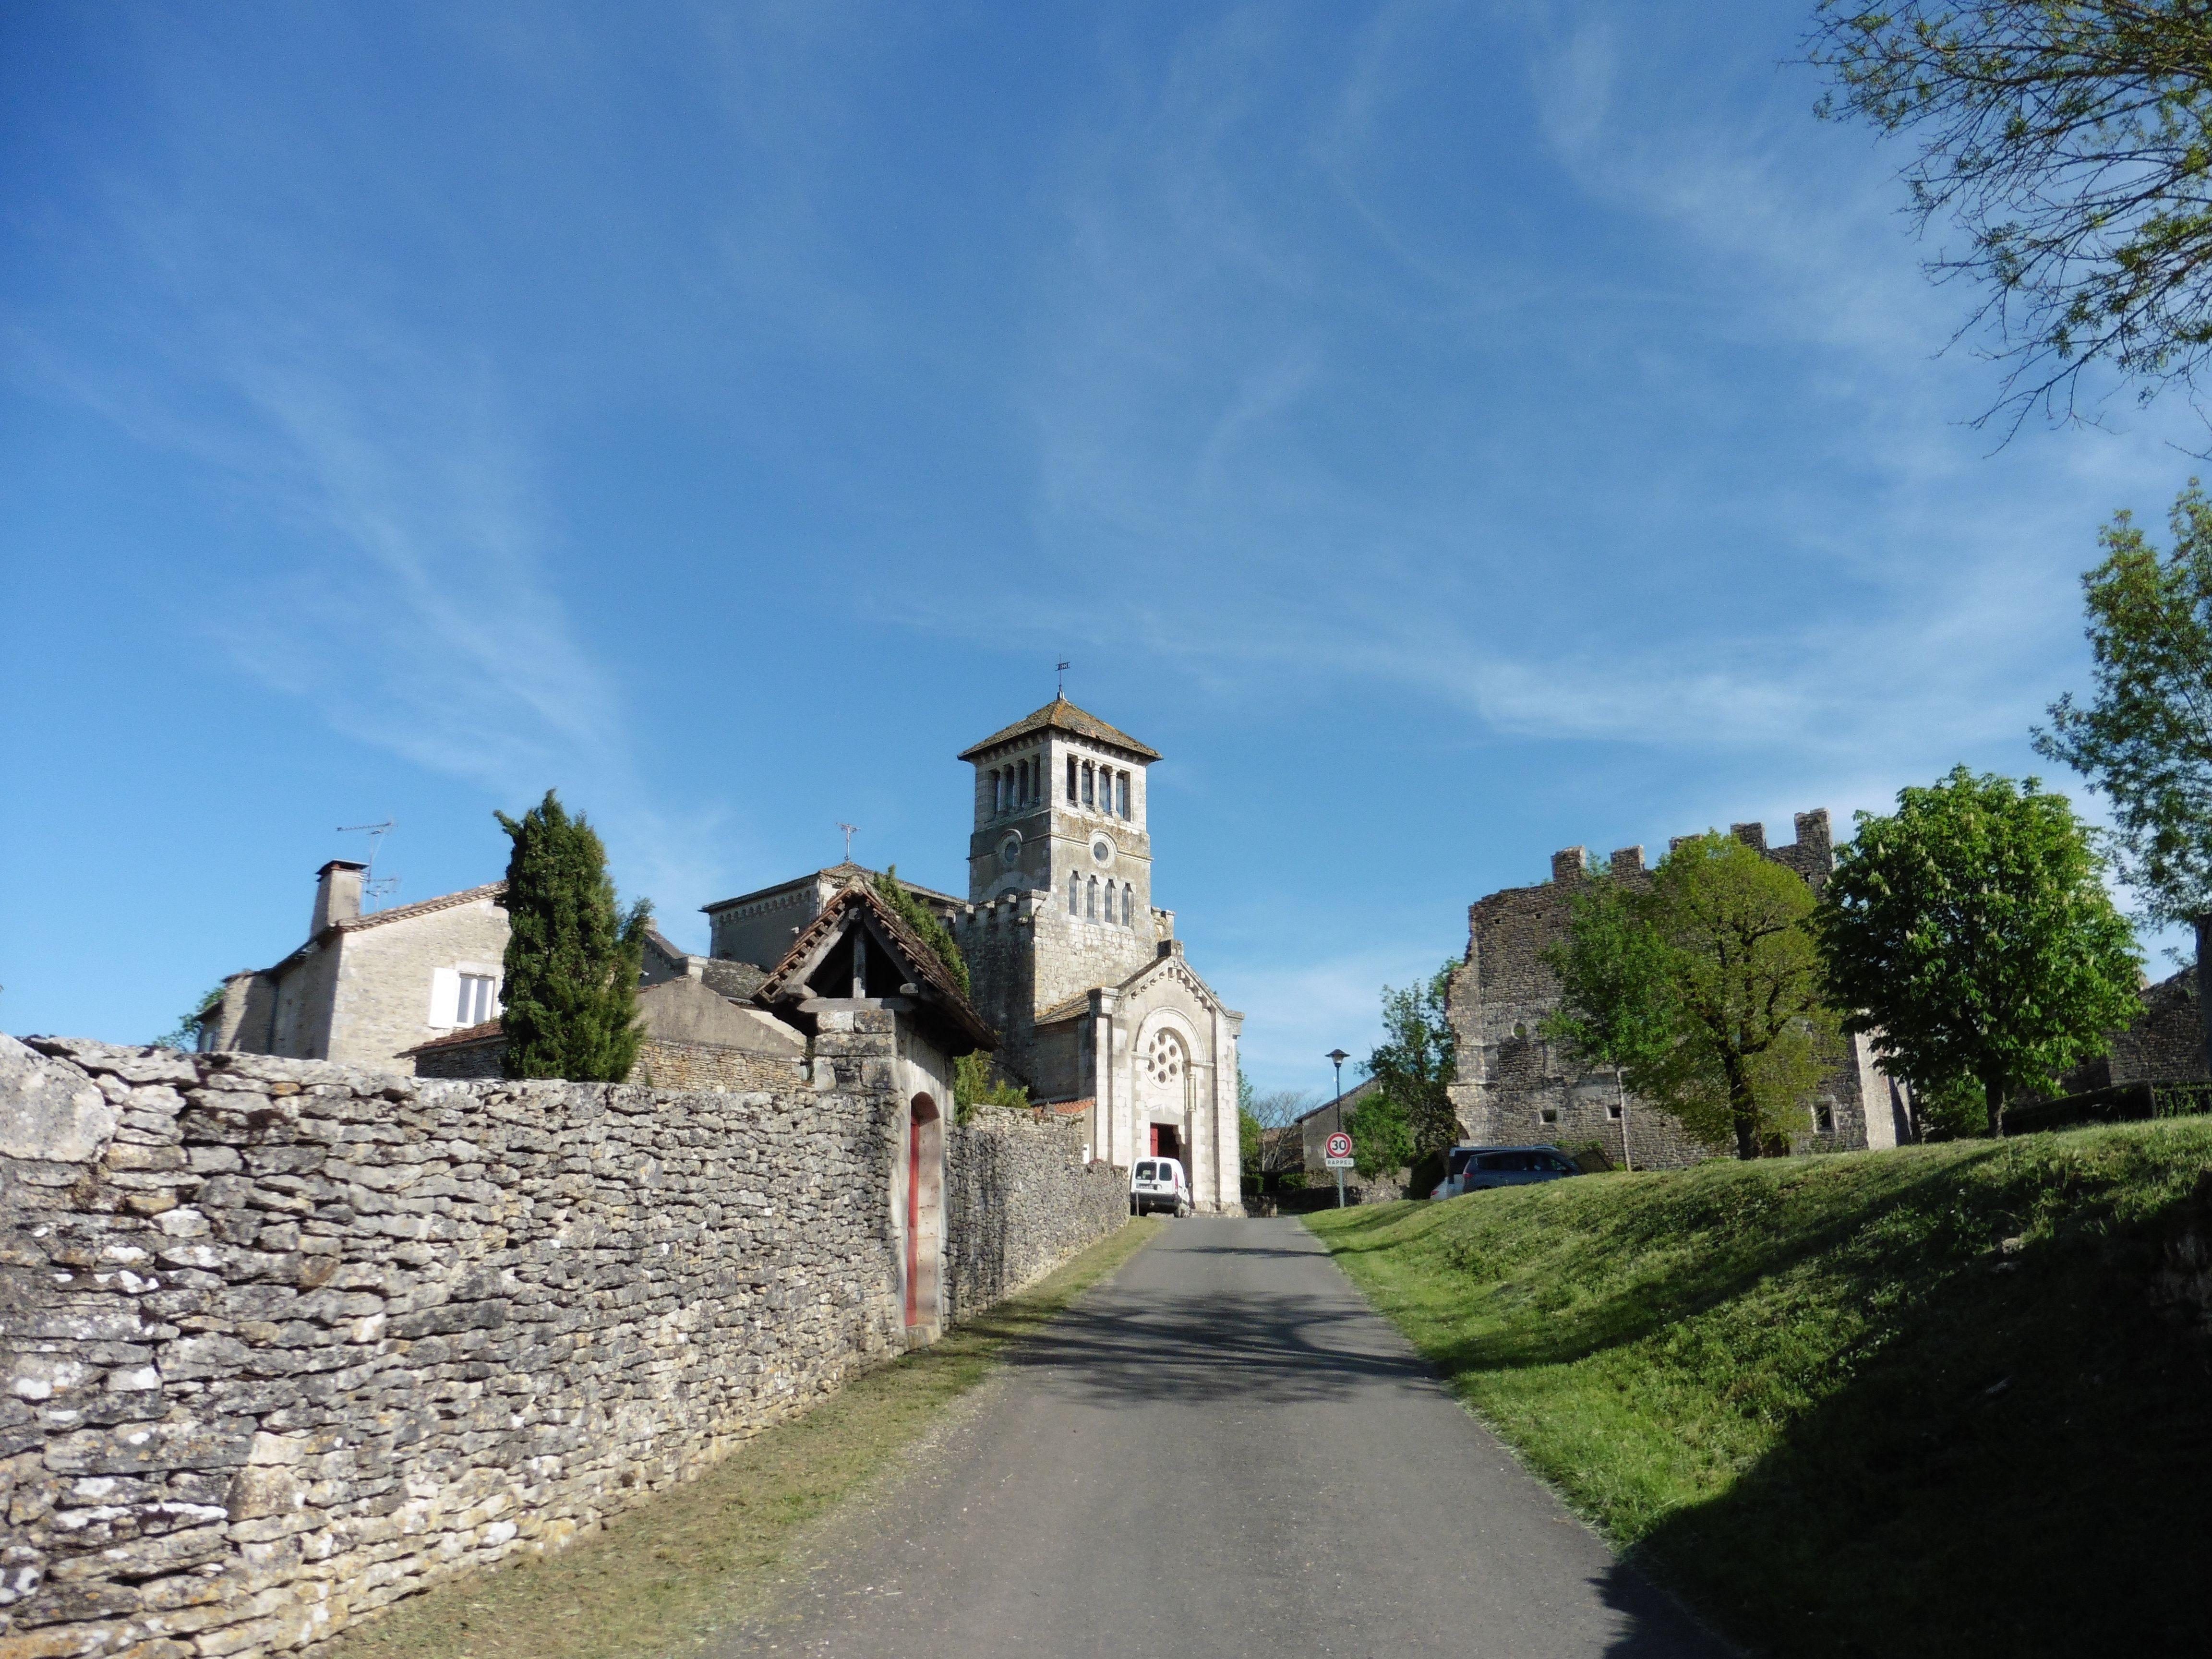 EGLISE SAINT JEAN BAPTISTE D'AUJOLS